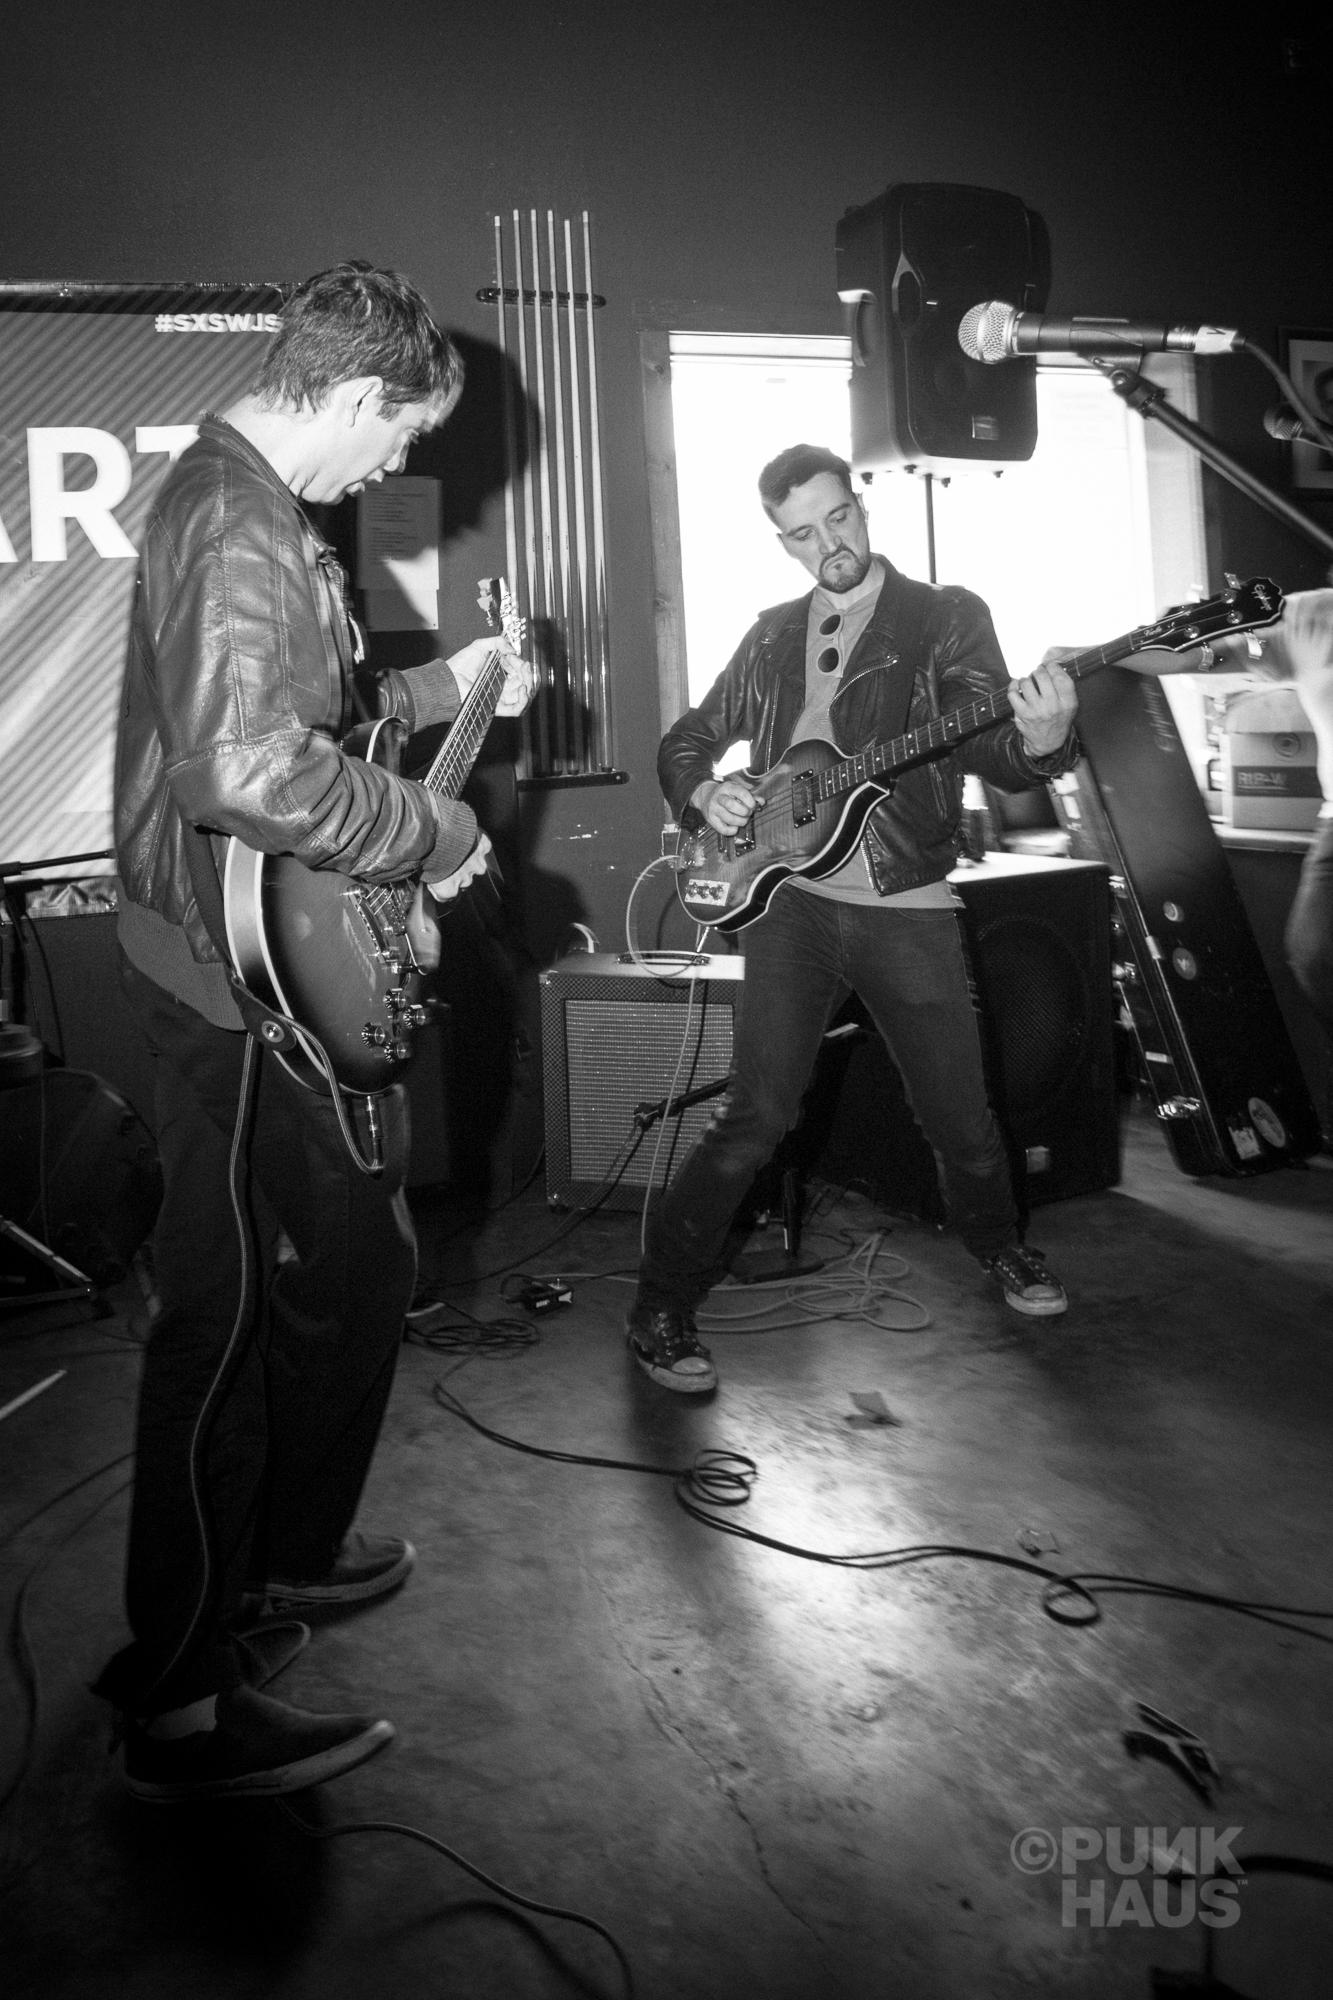 Ezra Furman & His Band The Boy-Friends